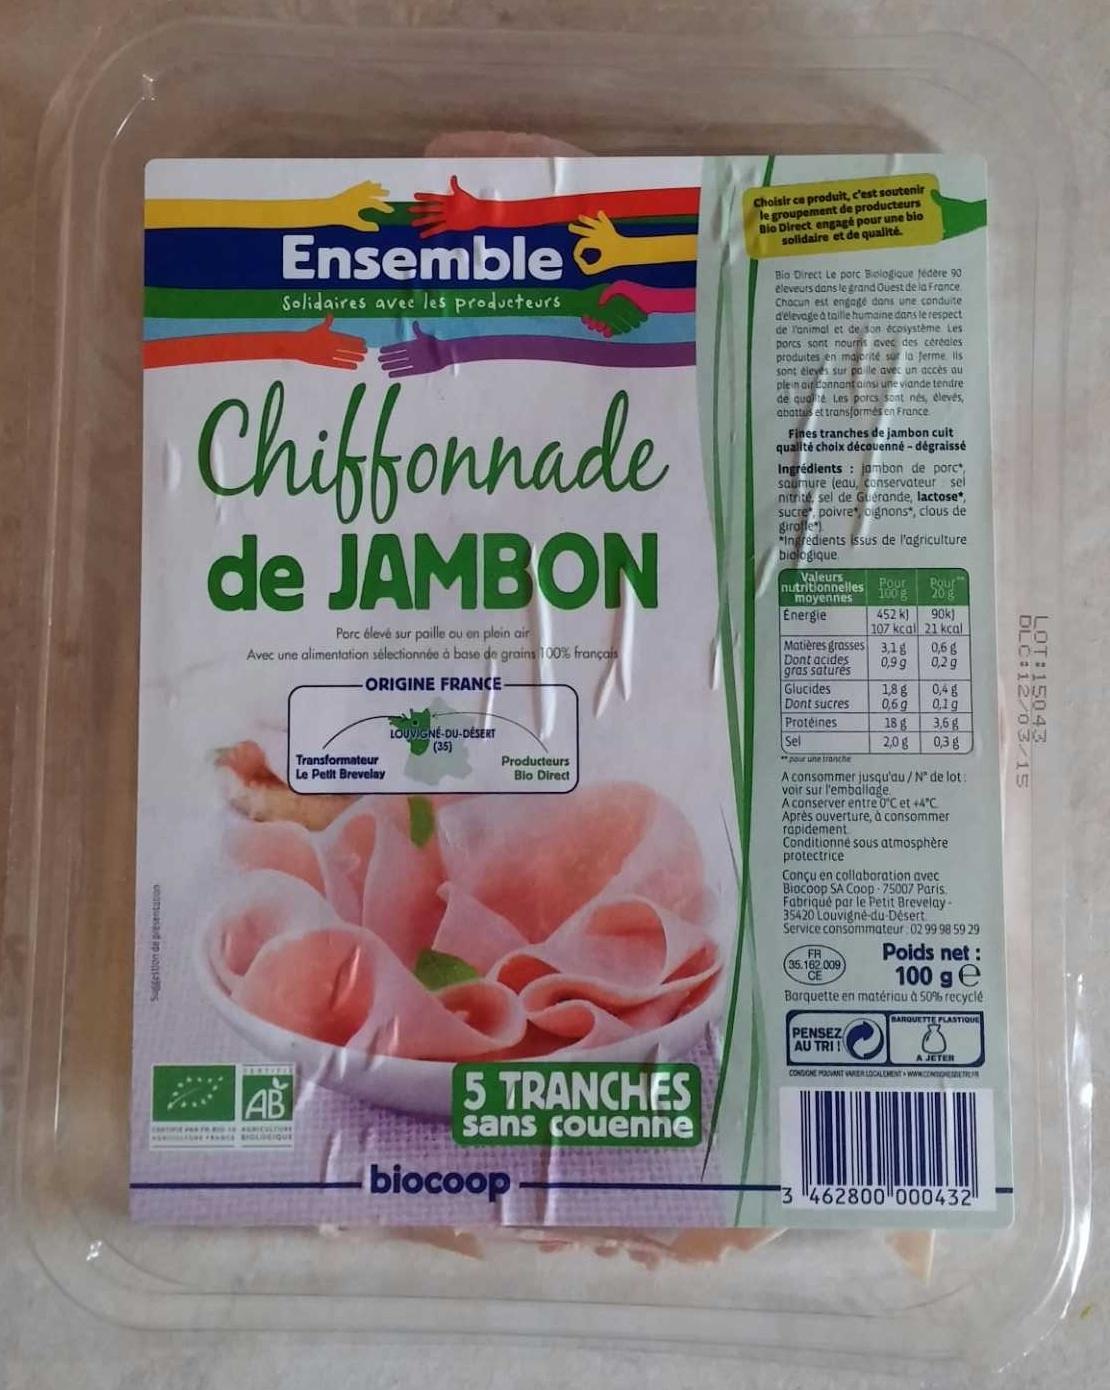 Chiffonade de jambon - Product